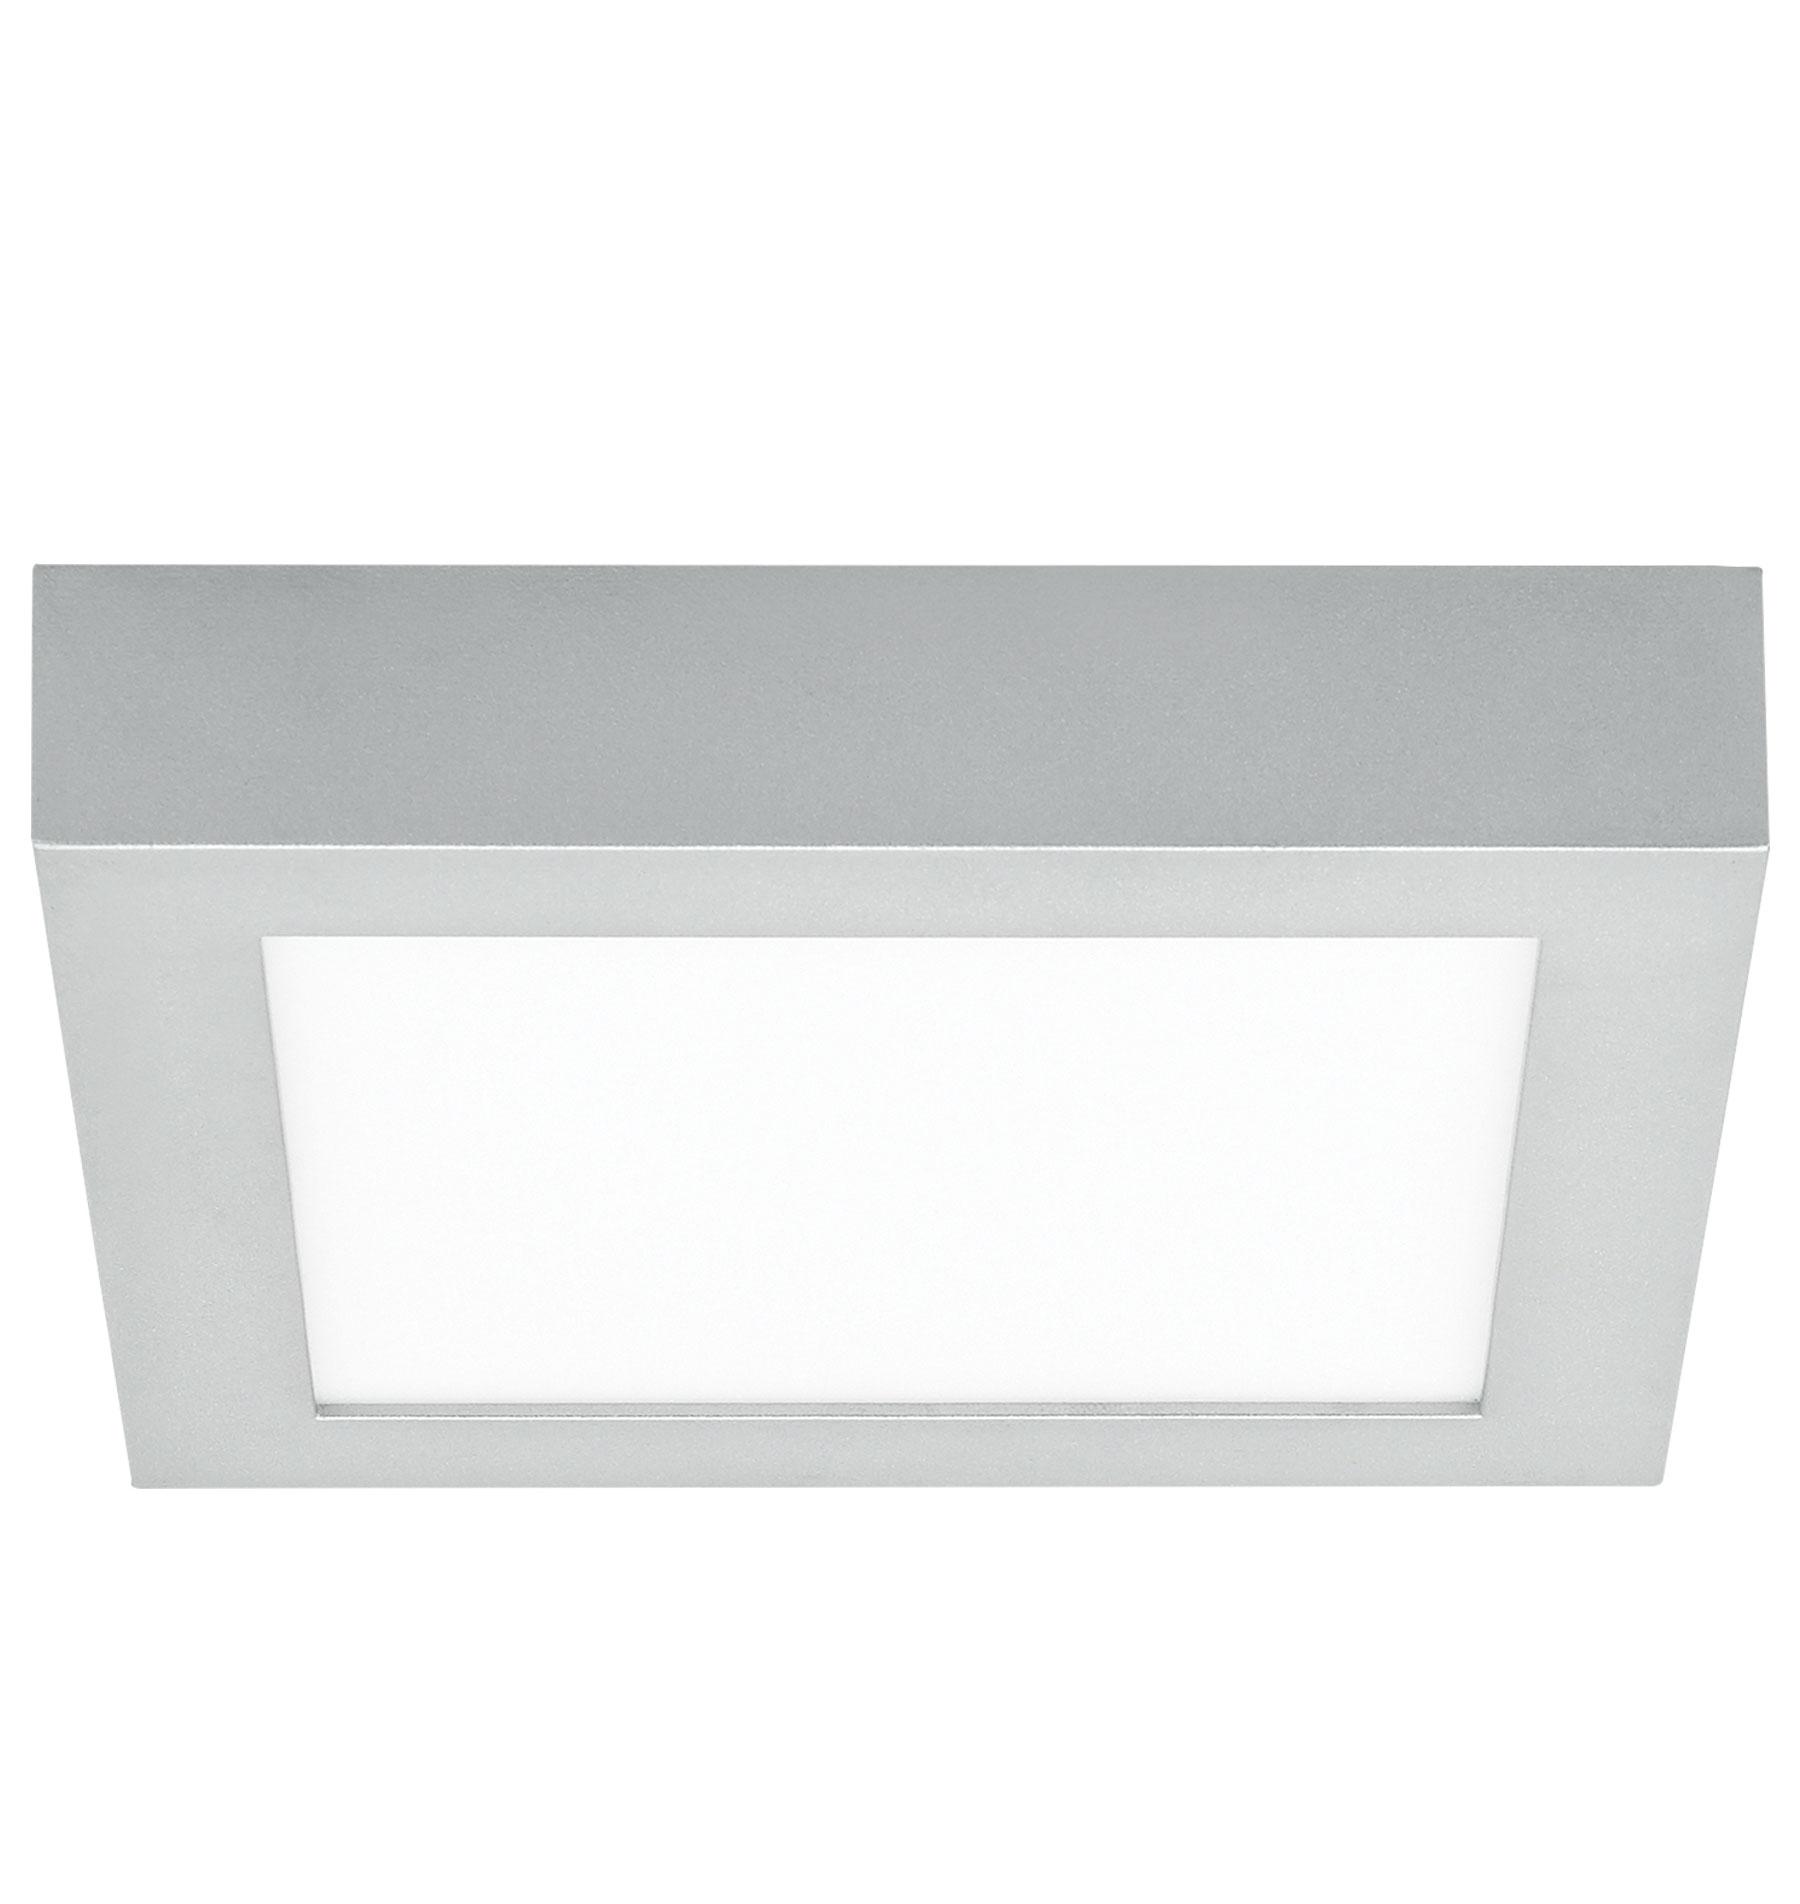 Tenur square ceiling light fixture by tech lighting 700fmtnrs9i led930